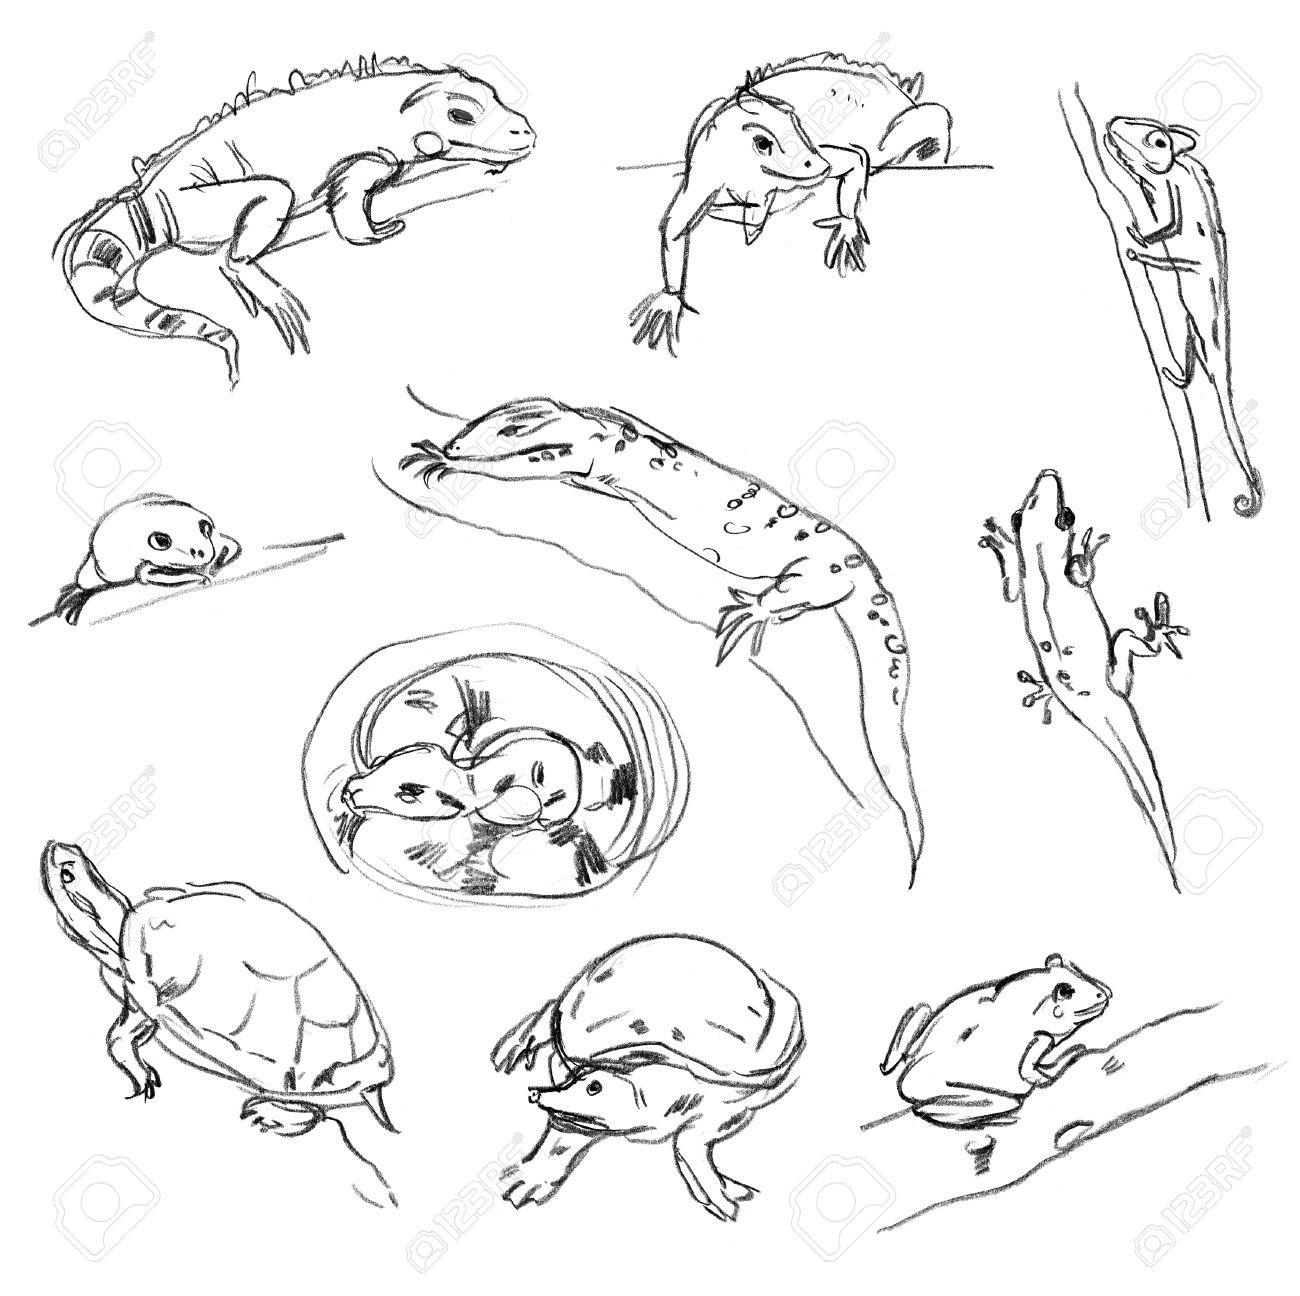 1300x1296 Reptiles. Set. Chameleon, Tree Frog, Iguana, Python, Boa, Turtle